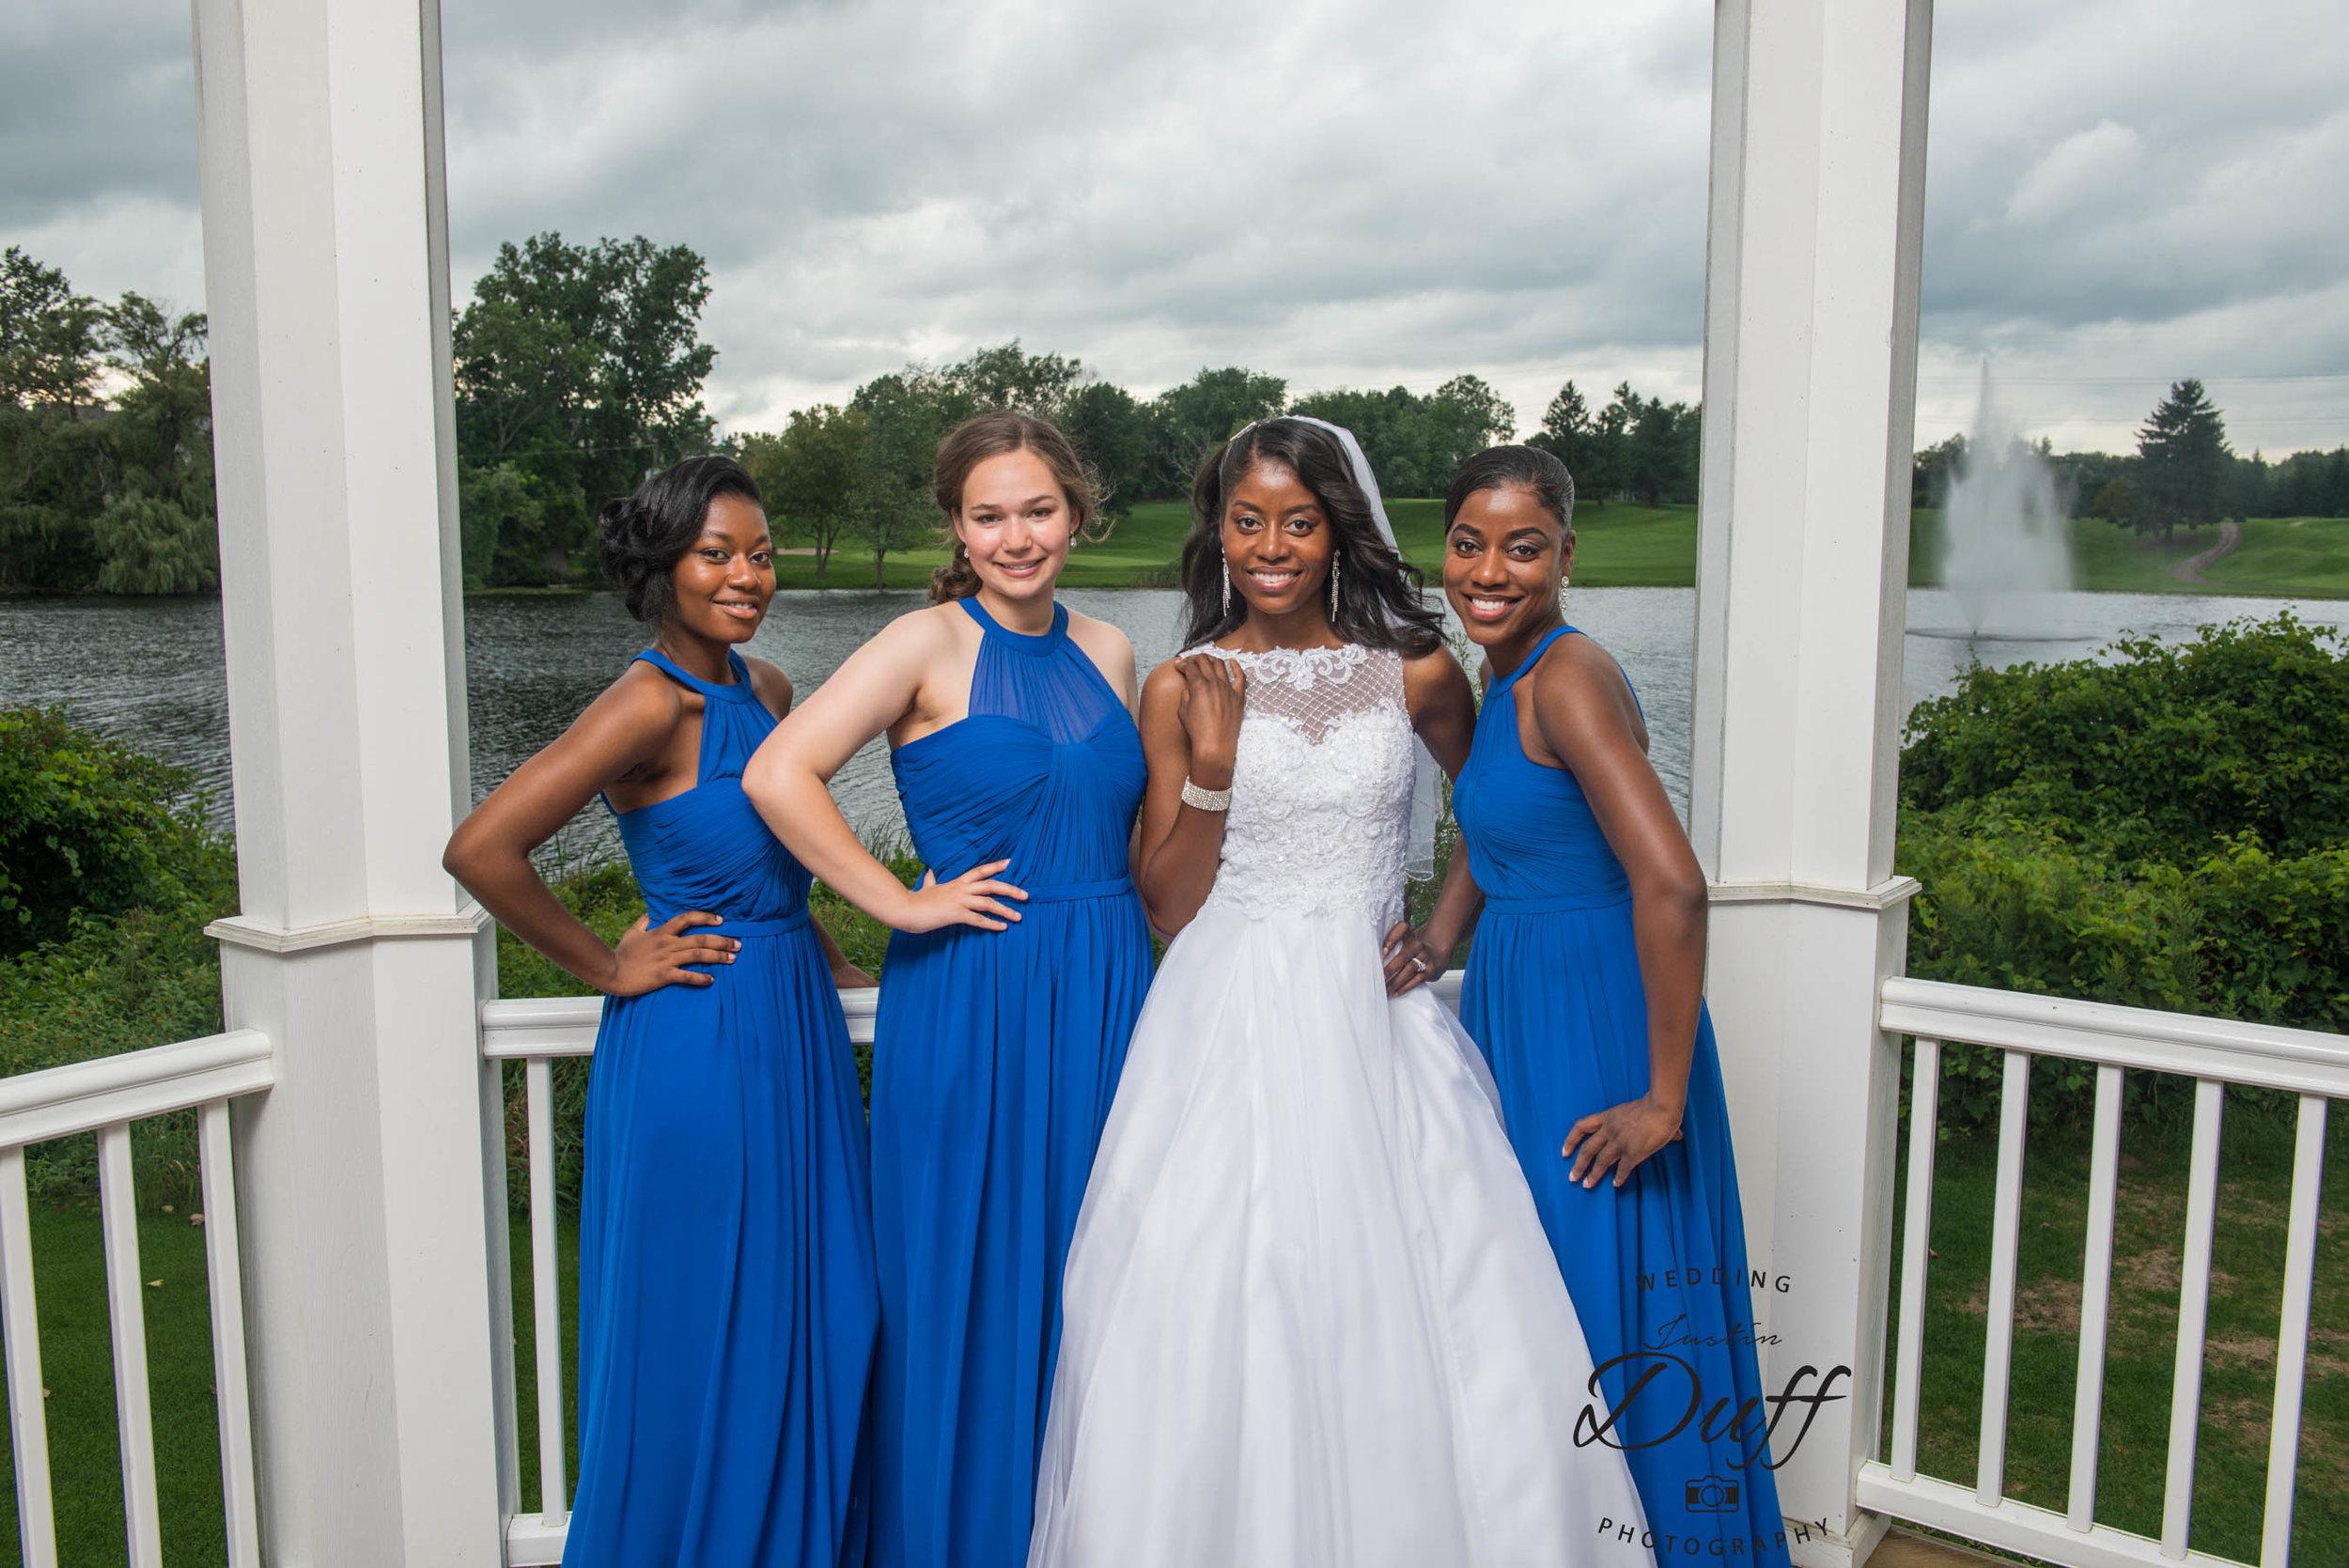 Fountains Golf Course Wedding - Royal Oak Photographer – Deanna & Shane bride and bridesmaids in the gazebo